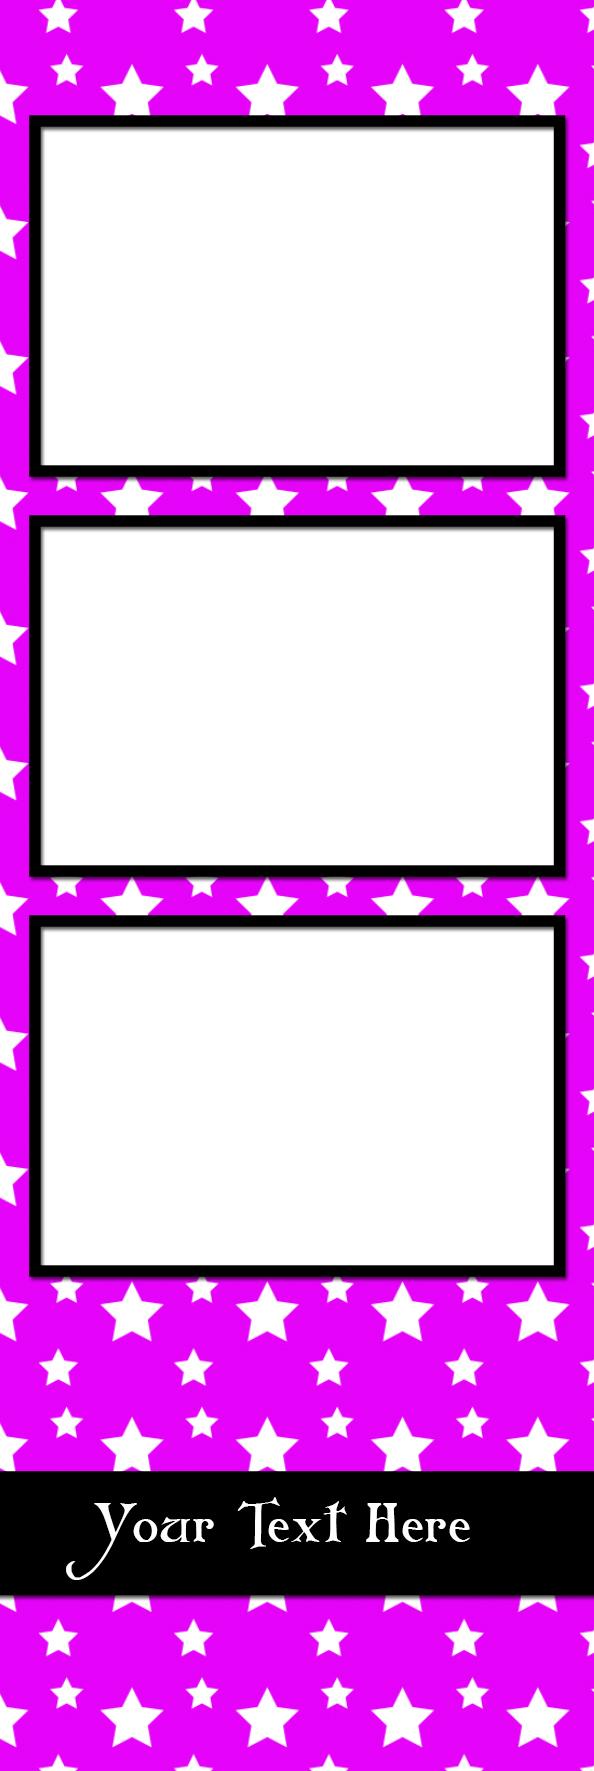 Texture_Stars-V-6P10.jpg